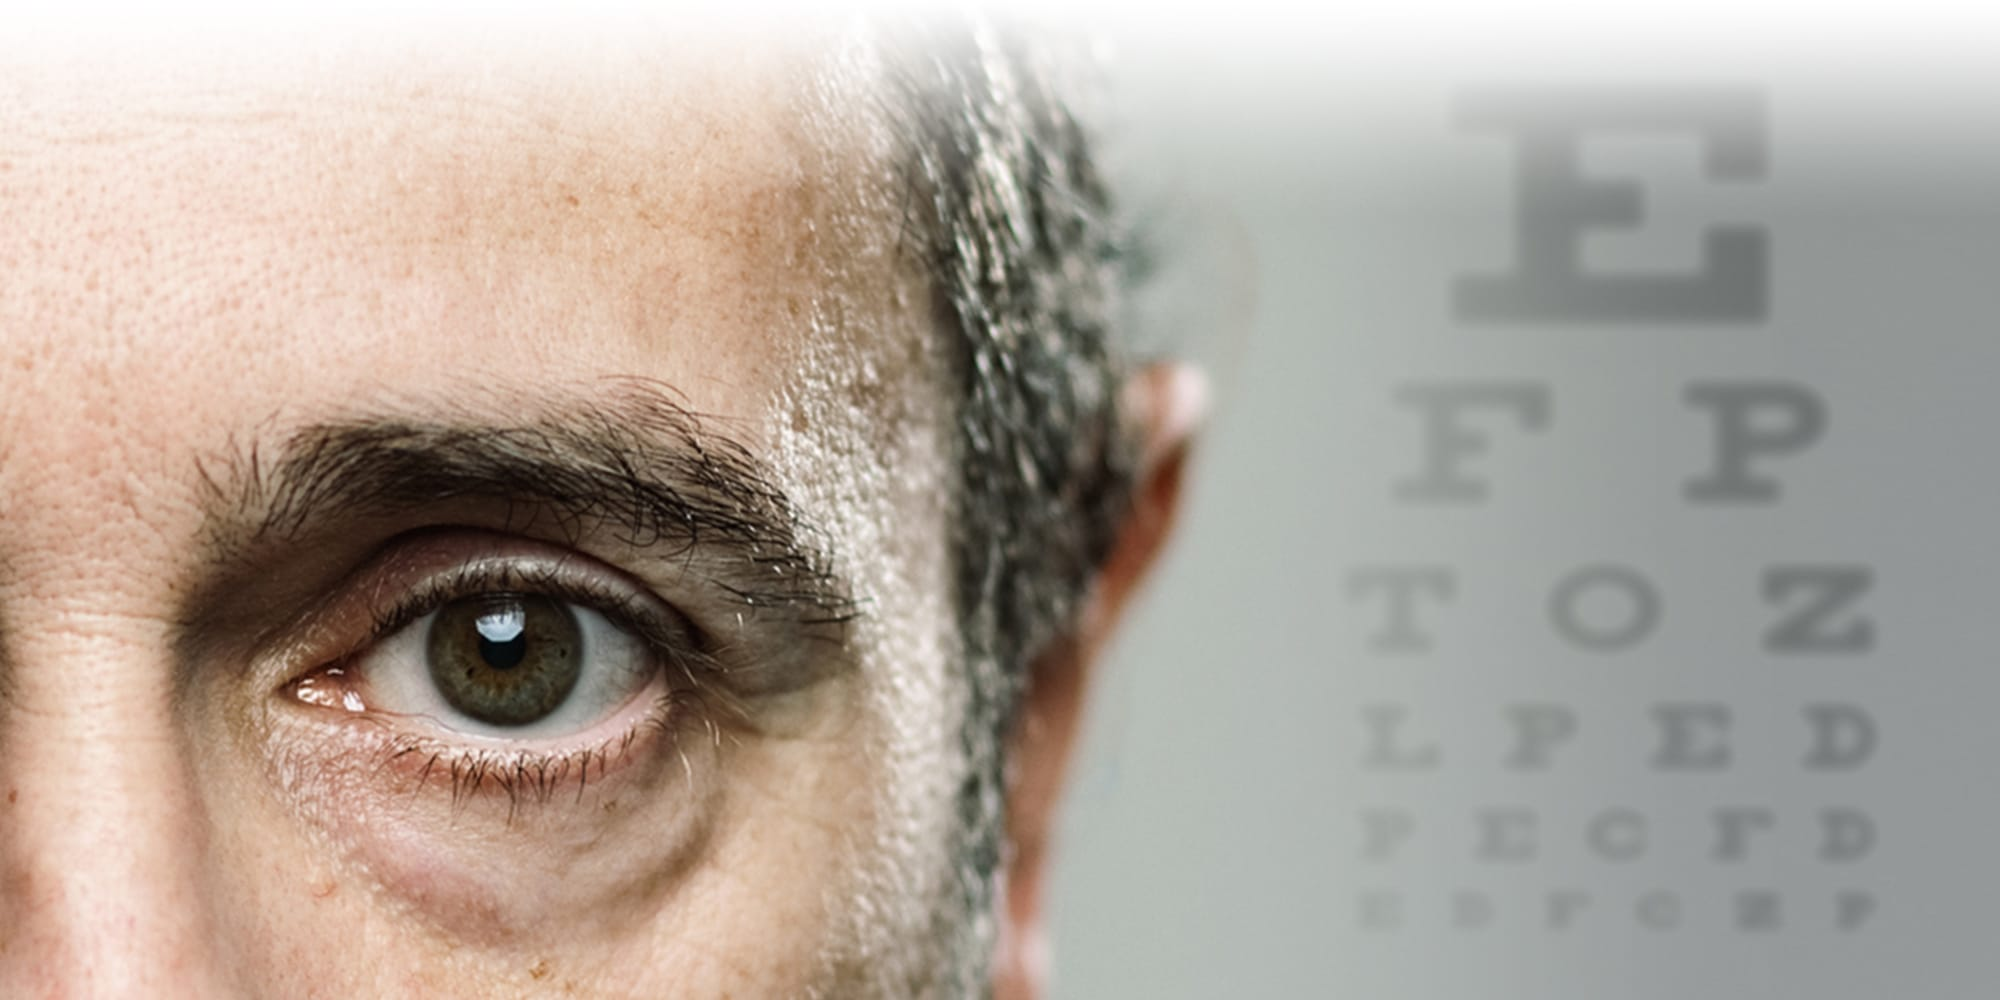 Southwest Eye Consultants